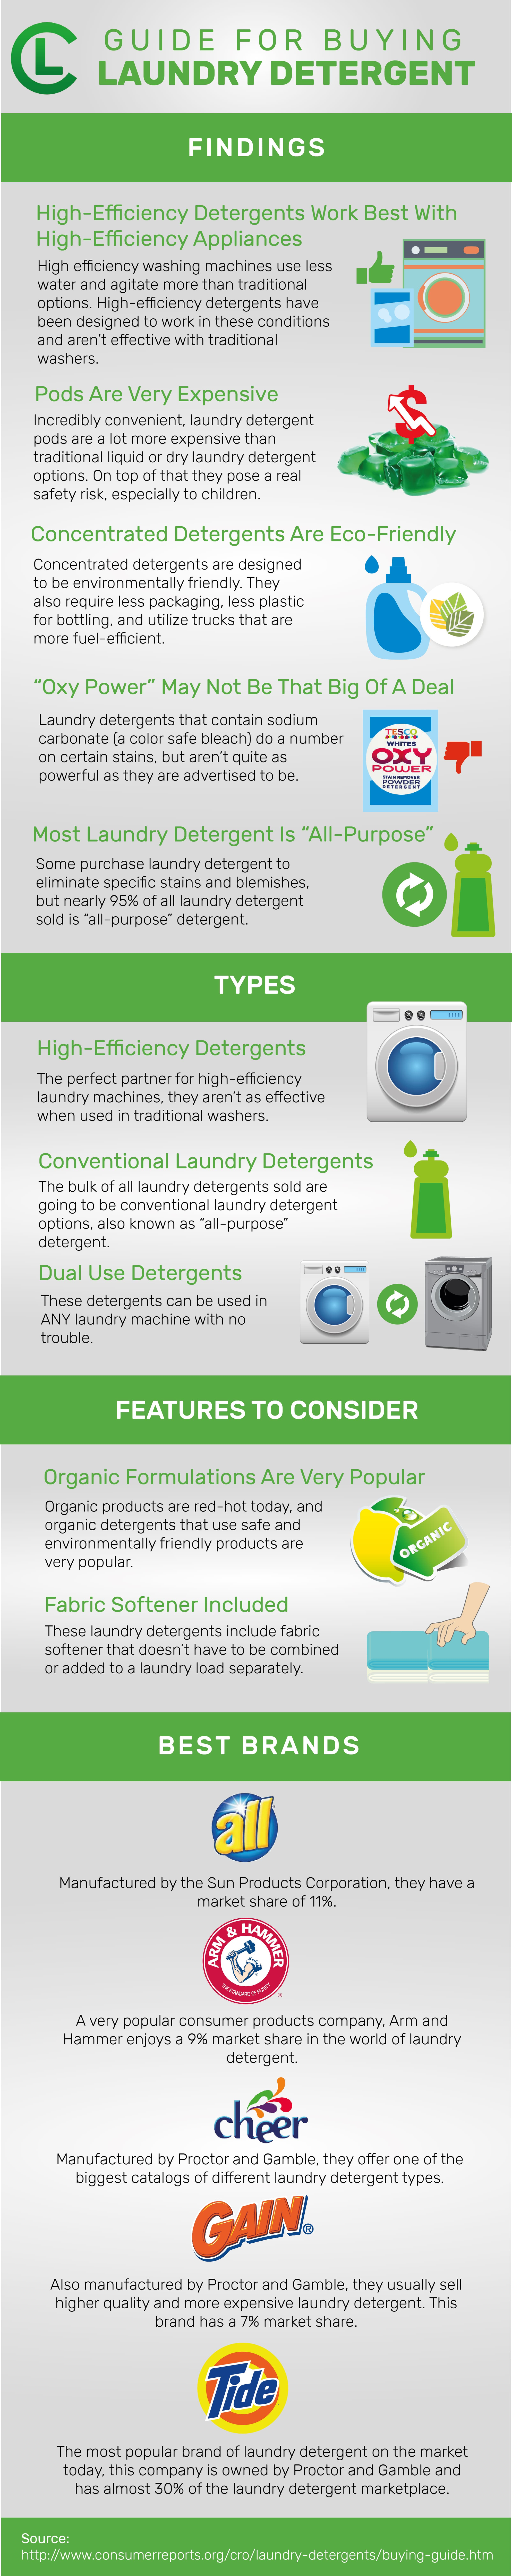 Detergent infographic